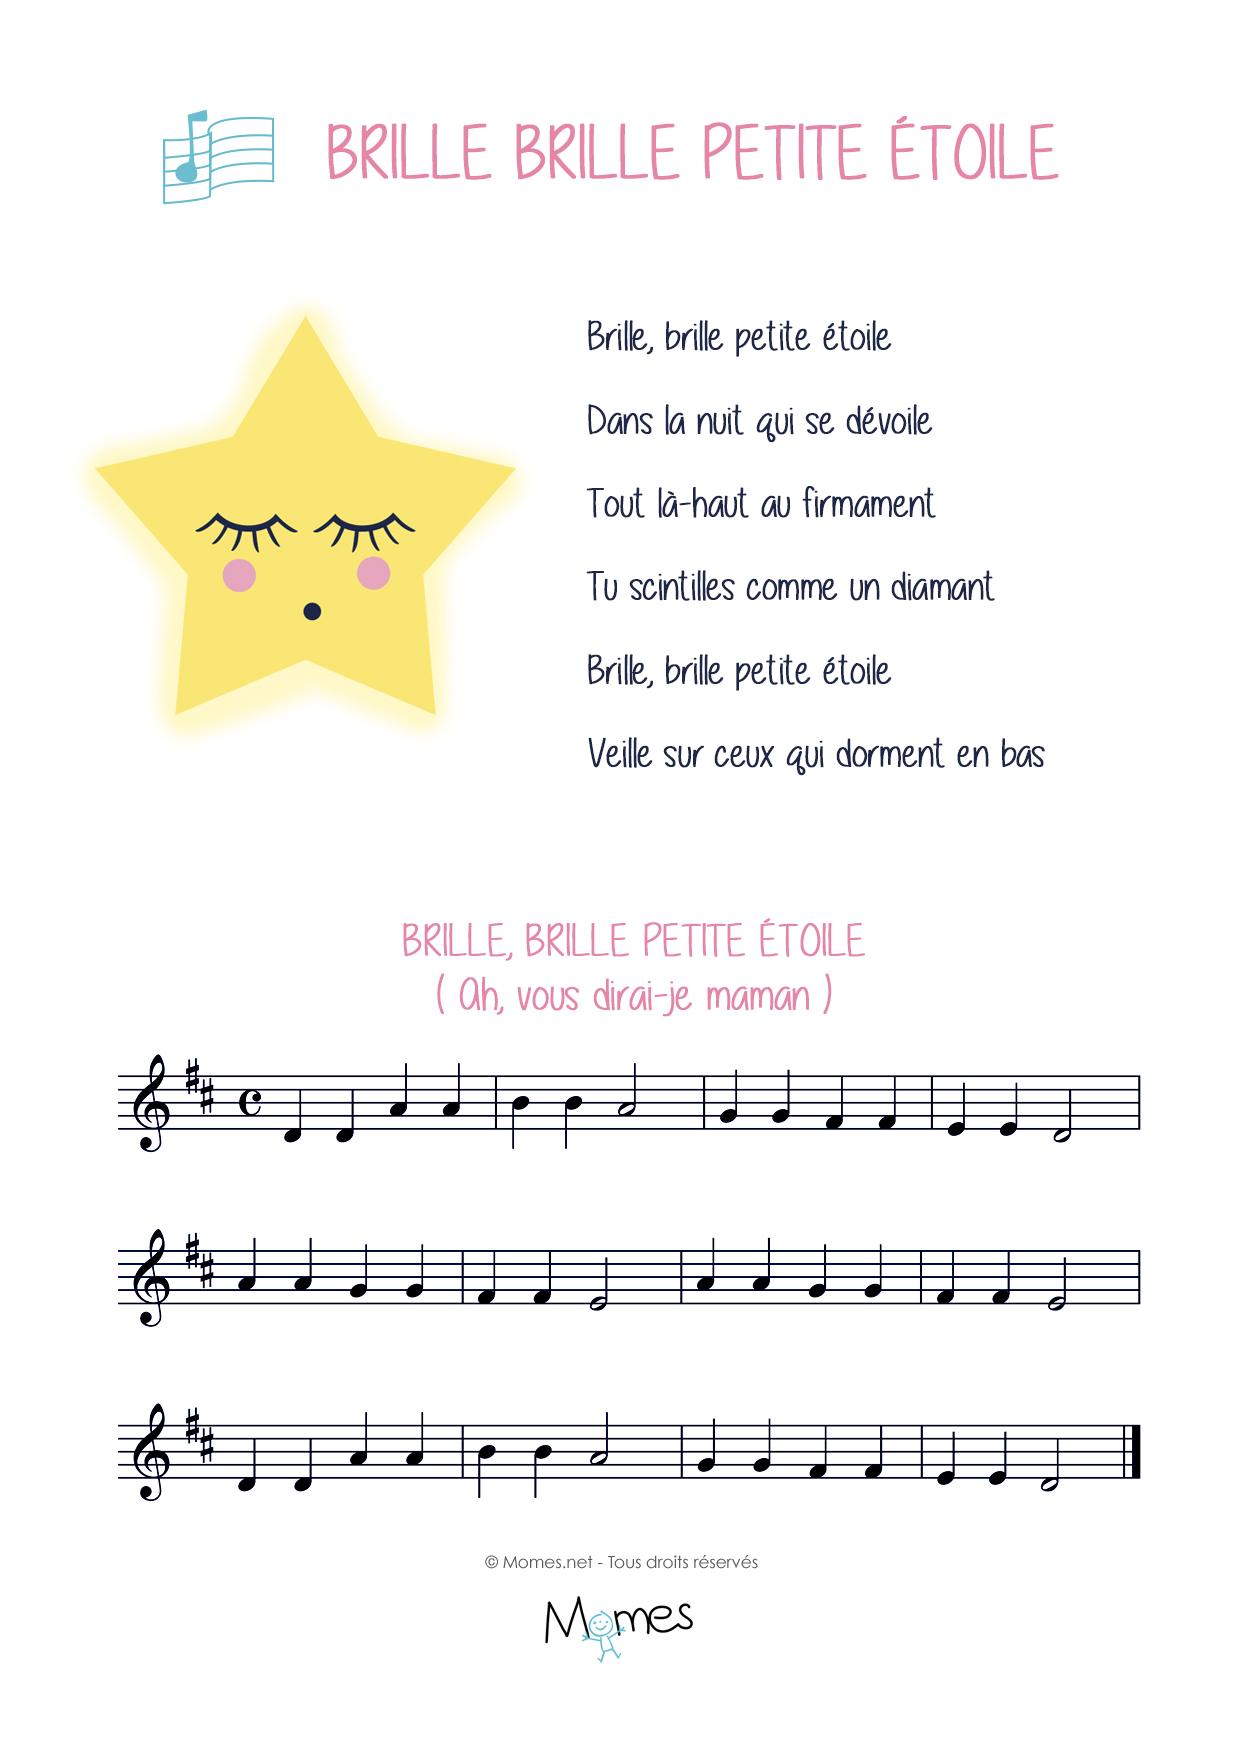 Twinkle tinkle litle star 9beach pee - 2 3